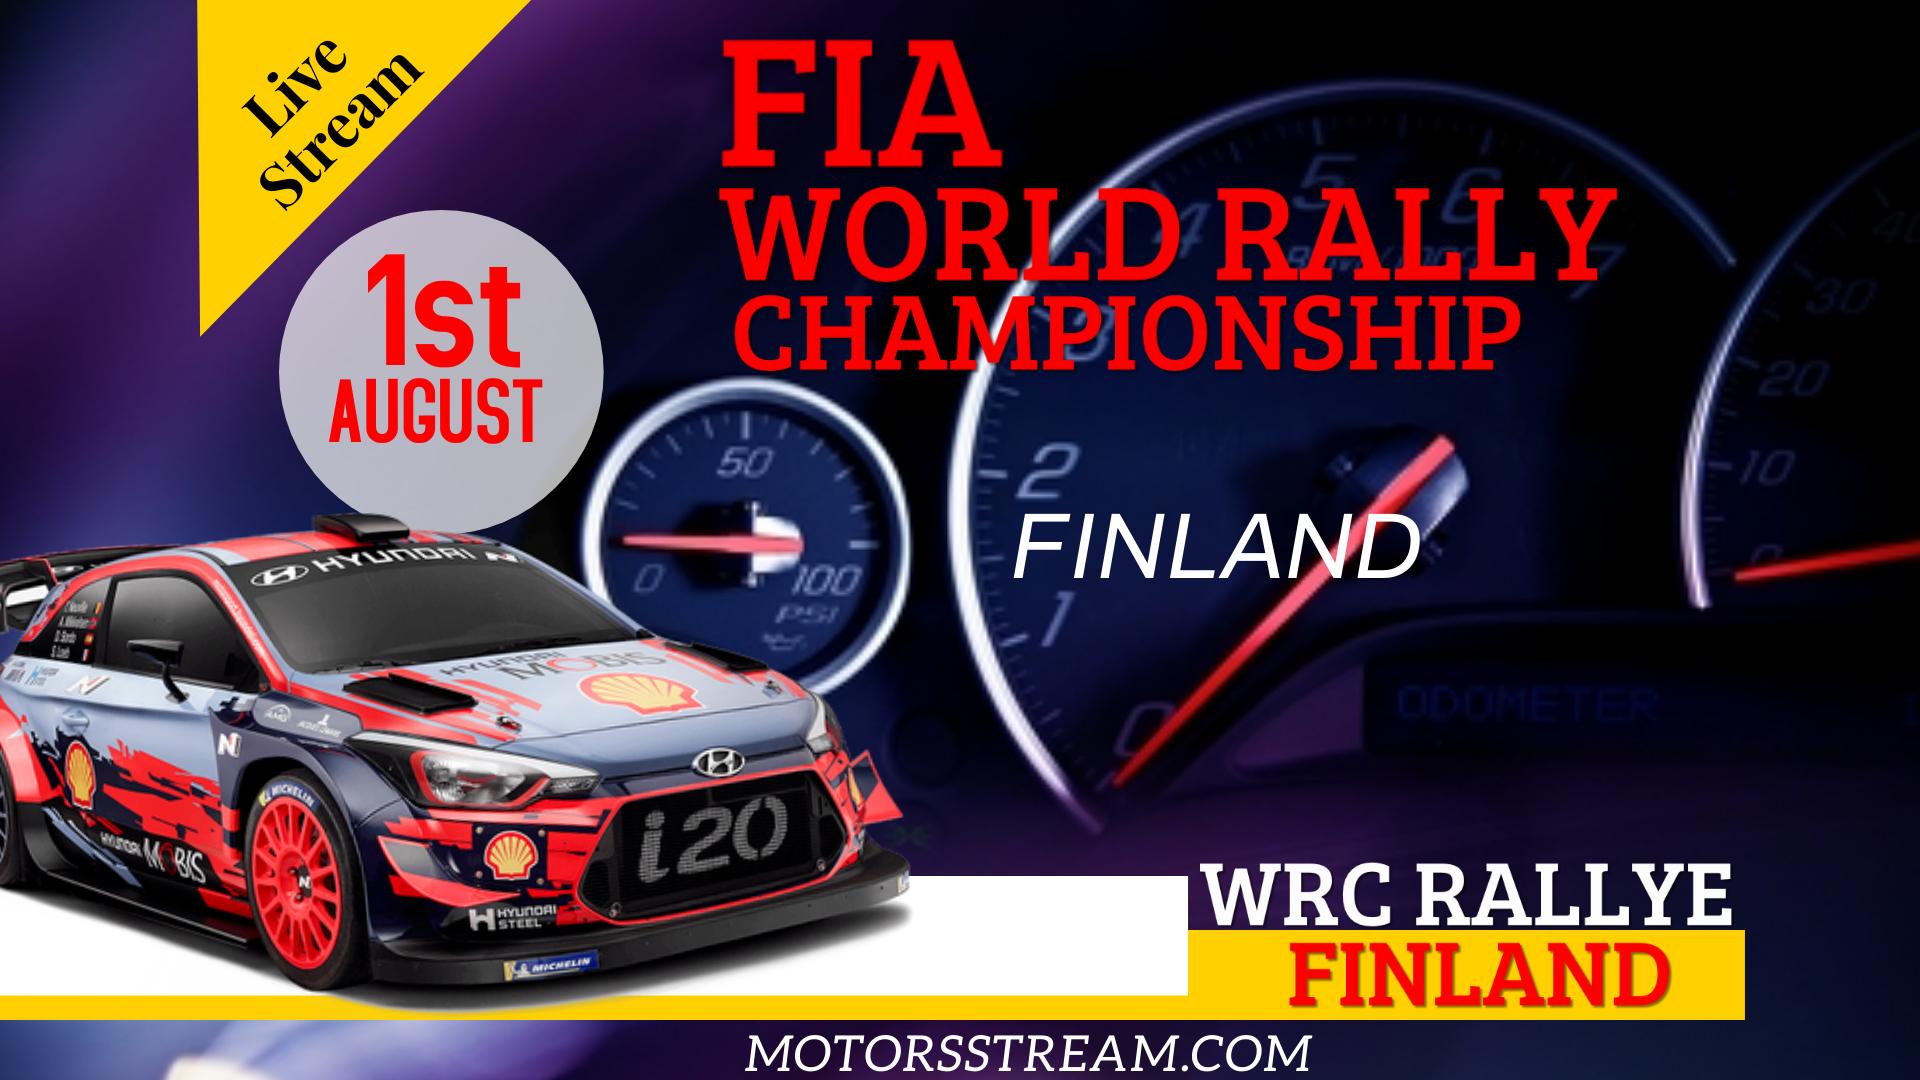 Rally Finland WRC Live Stream 2021 | Round 8